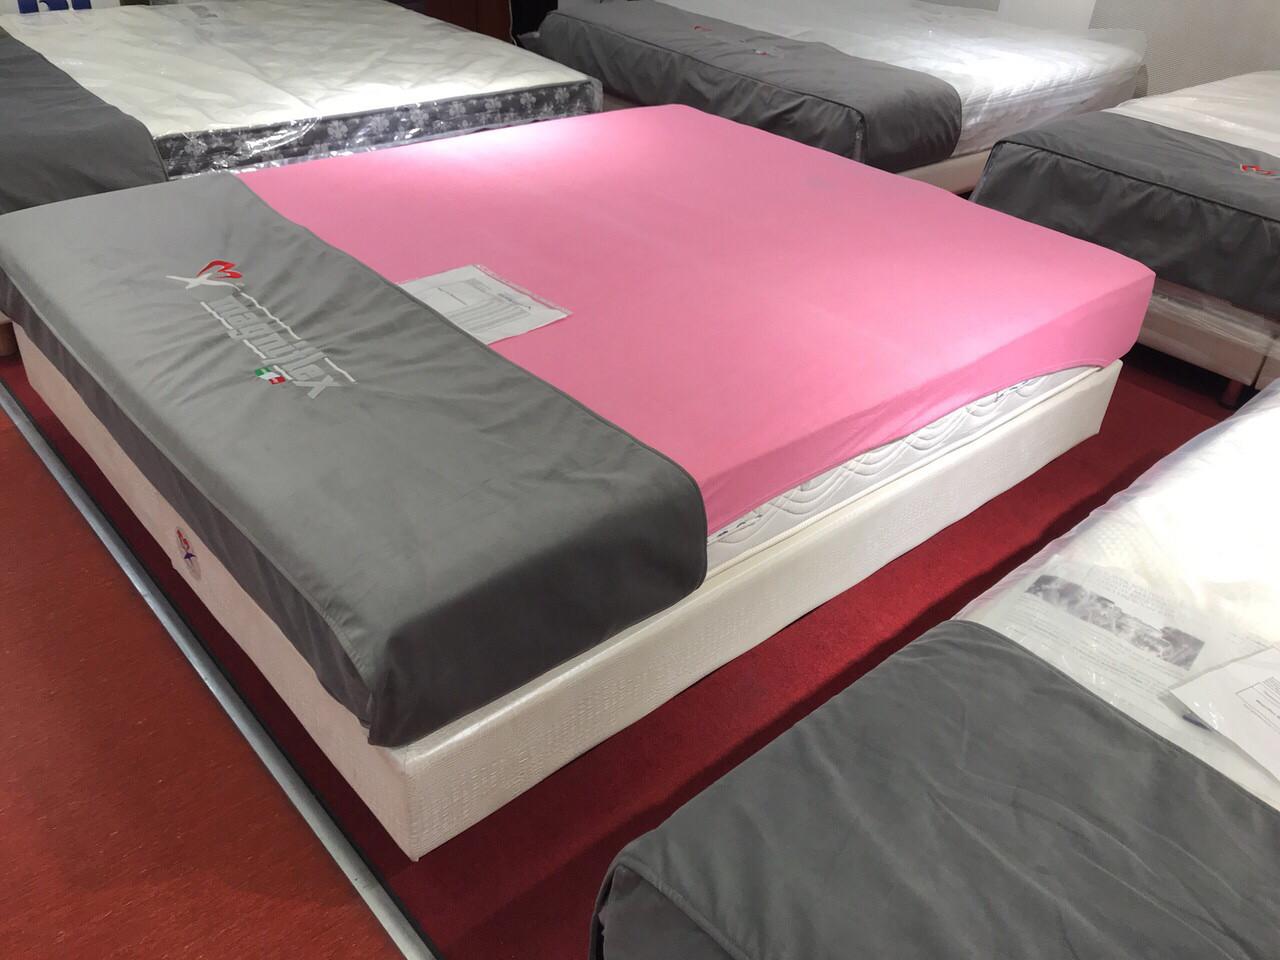 Матрац Magniflex Naturcomfort 160х200 (Экспозиция)